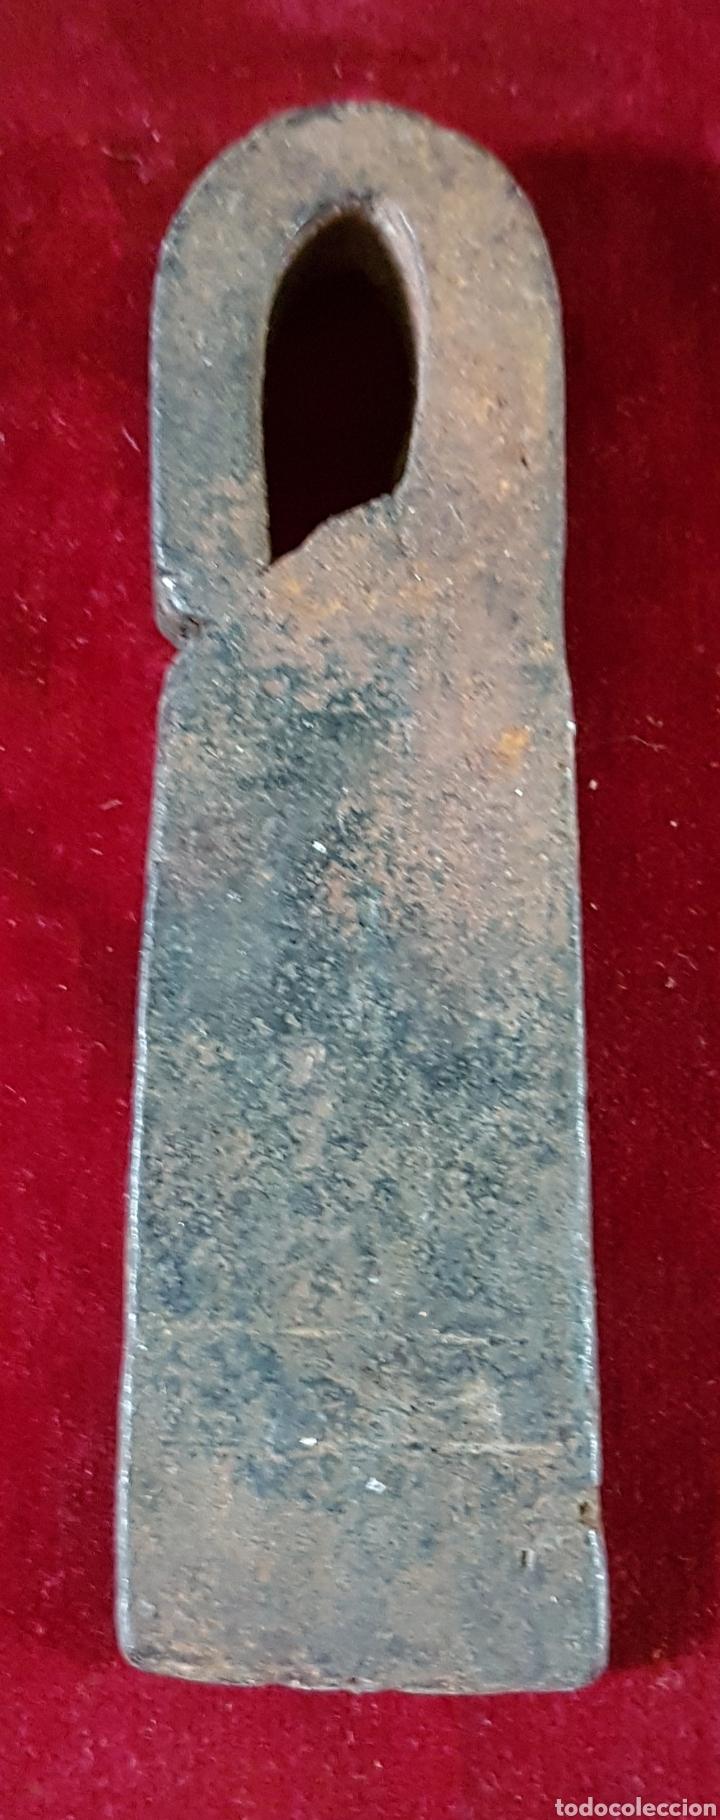 Antigüedades: Antigua romana medida peso forja - Foto 2 - 163034010